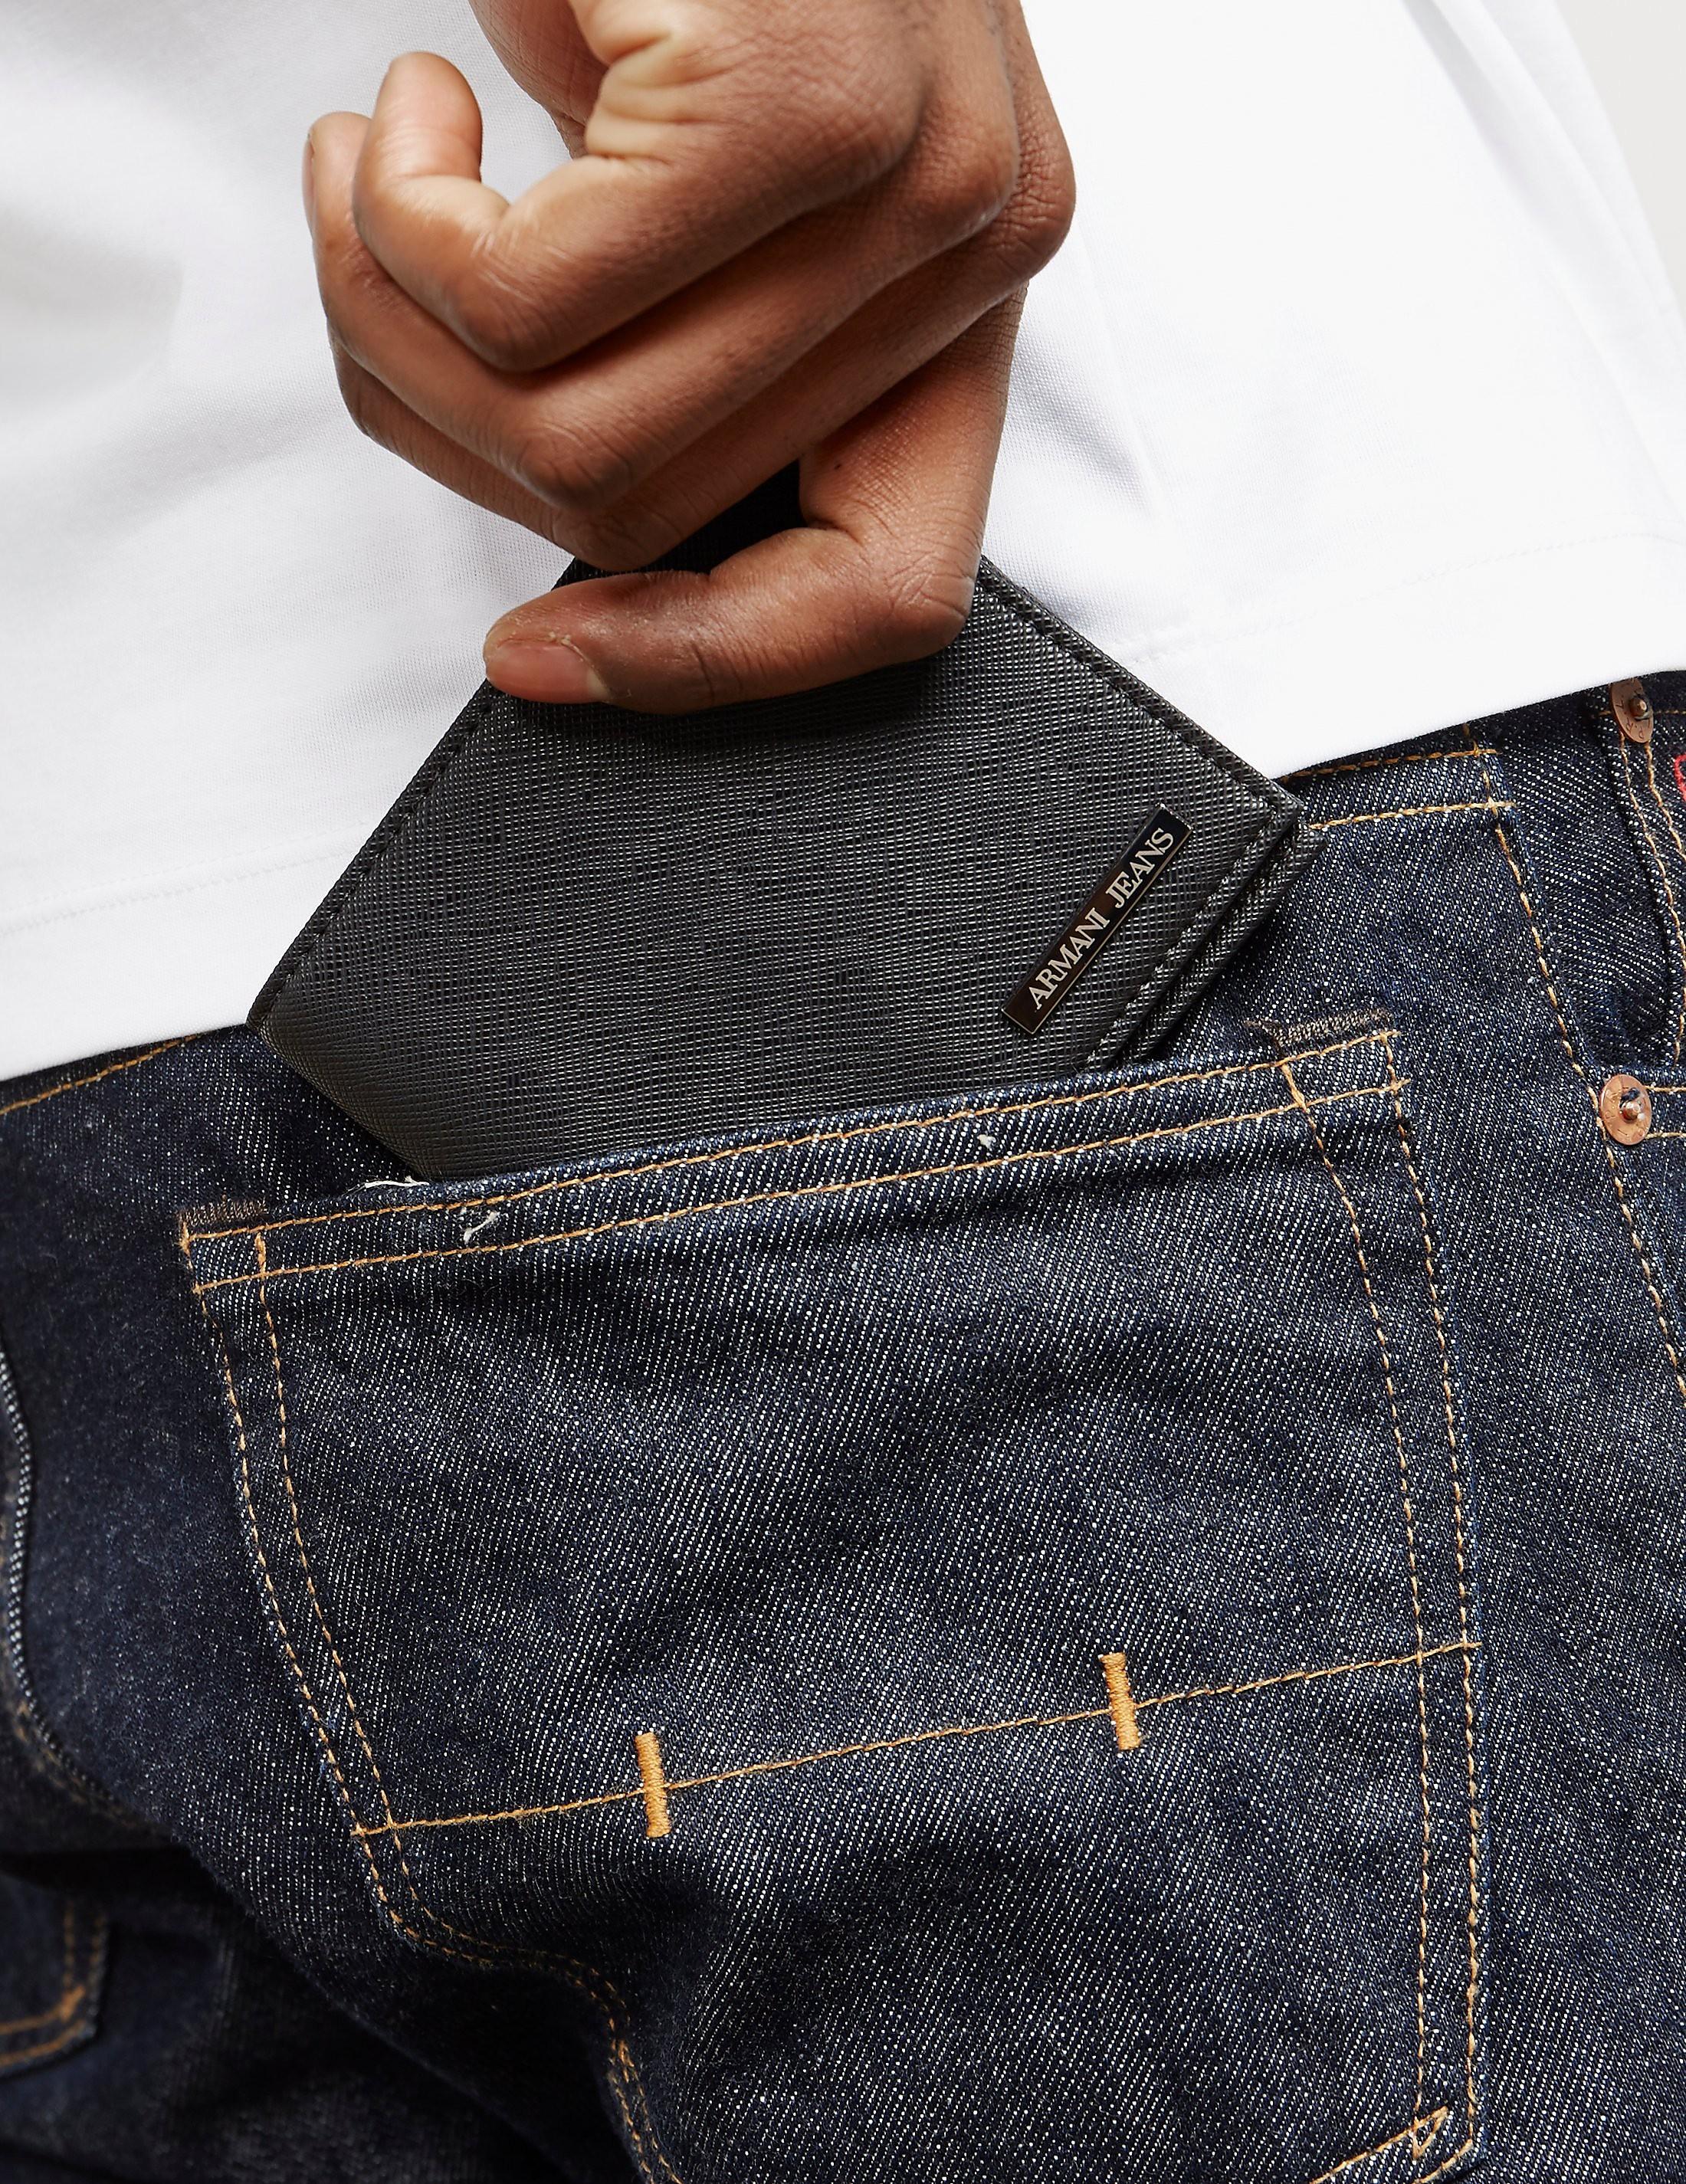 Armani Jeans Saff Billford Wallet